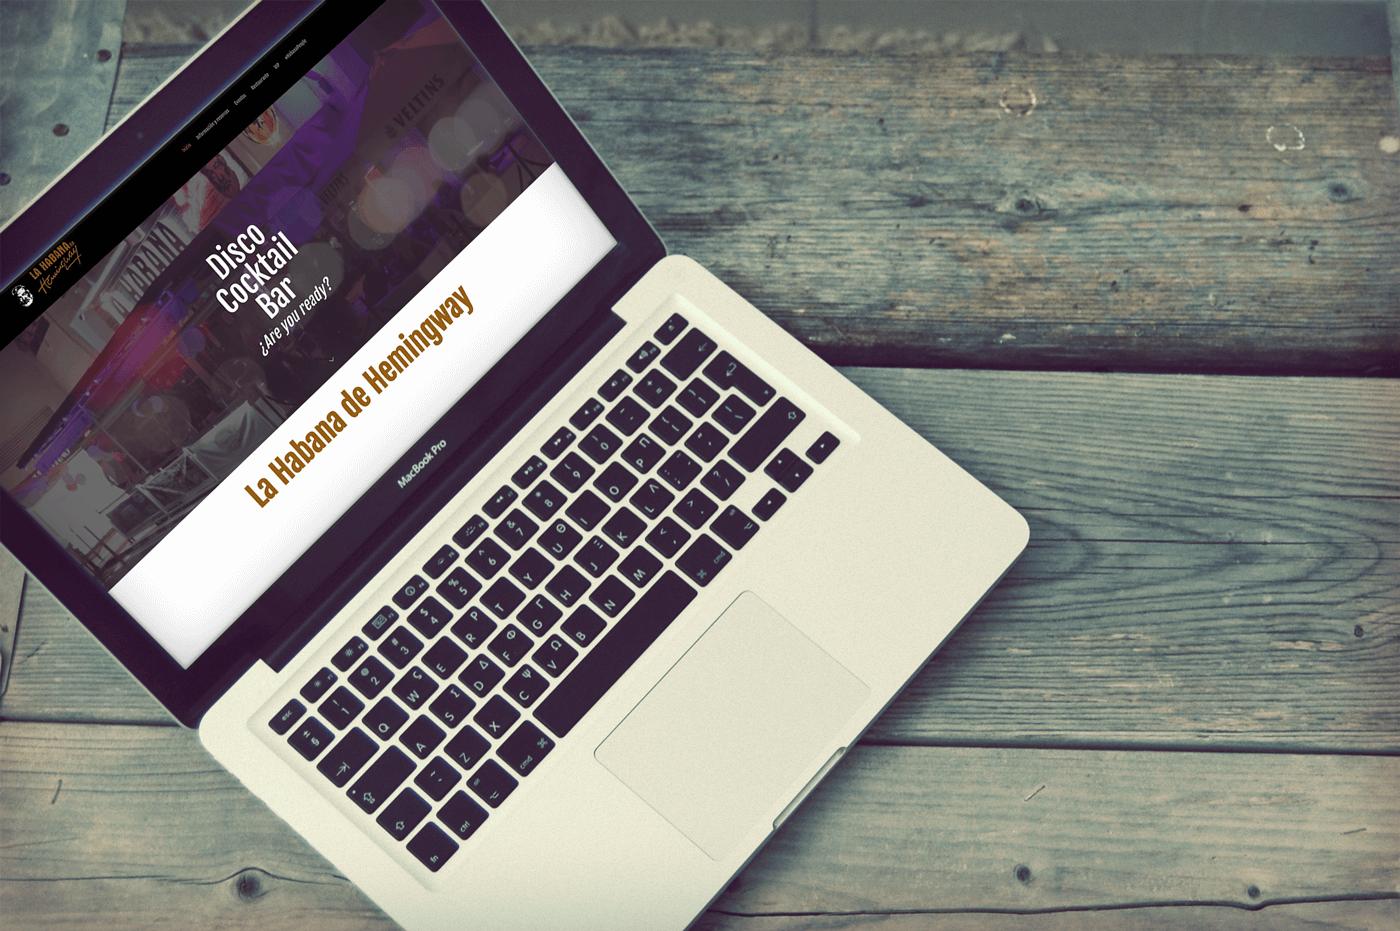 La Habana de Hemingway Diseño web